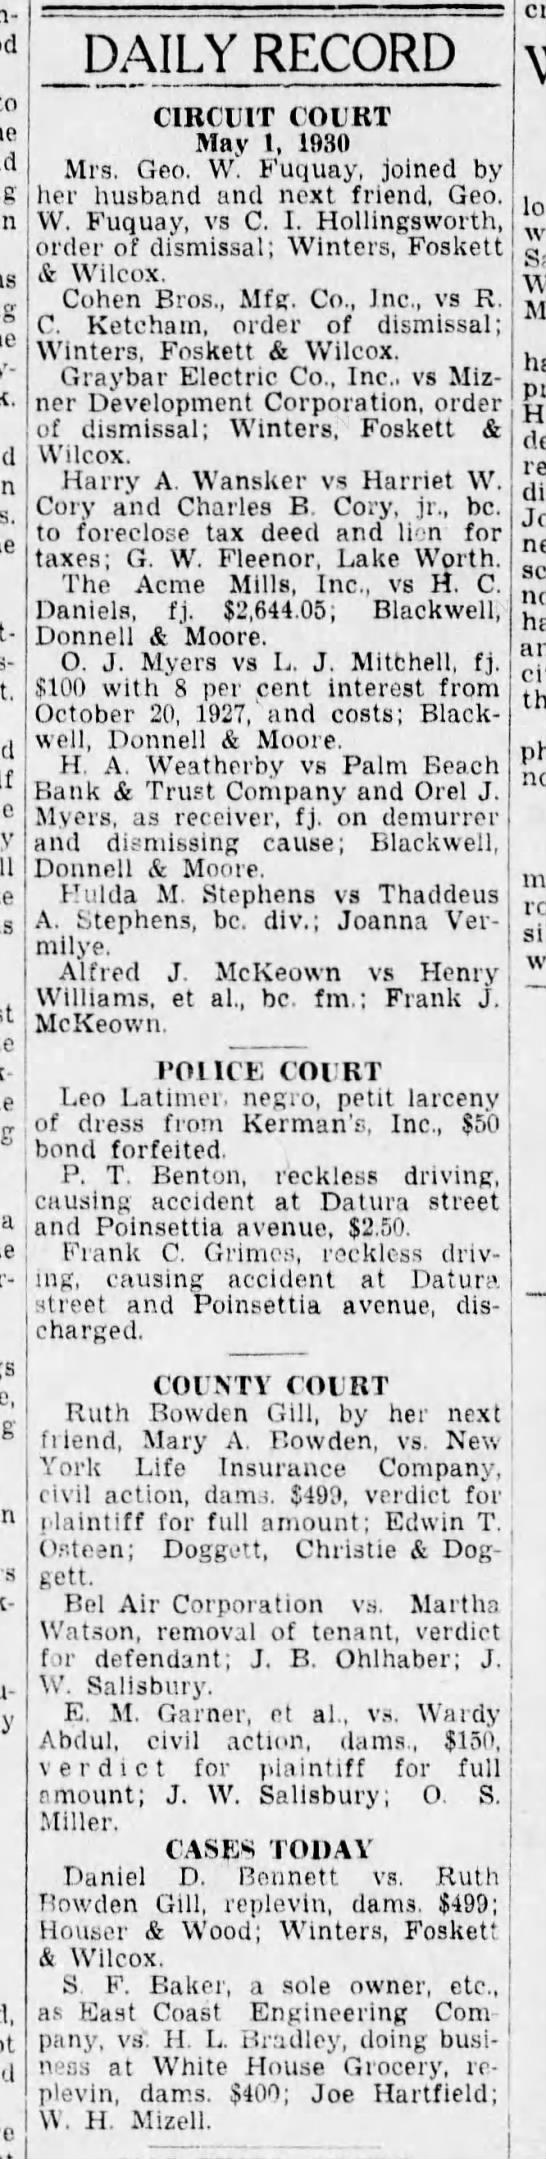 Court record, 1930